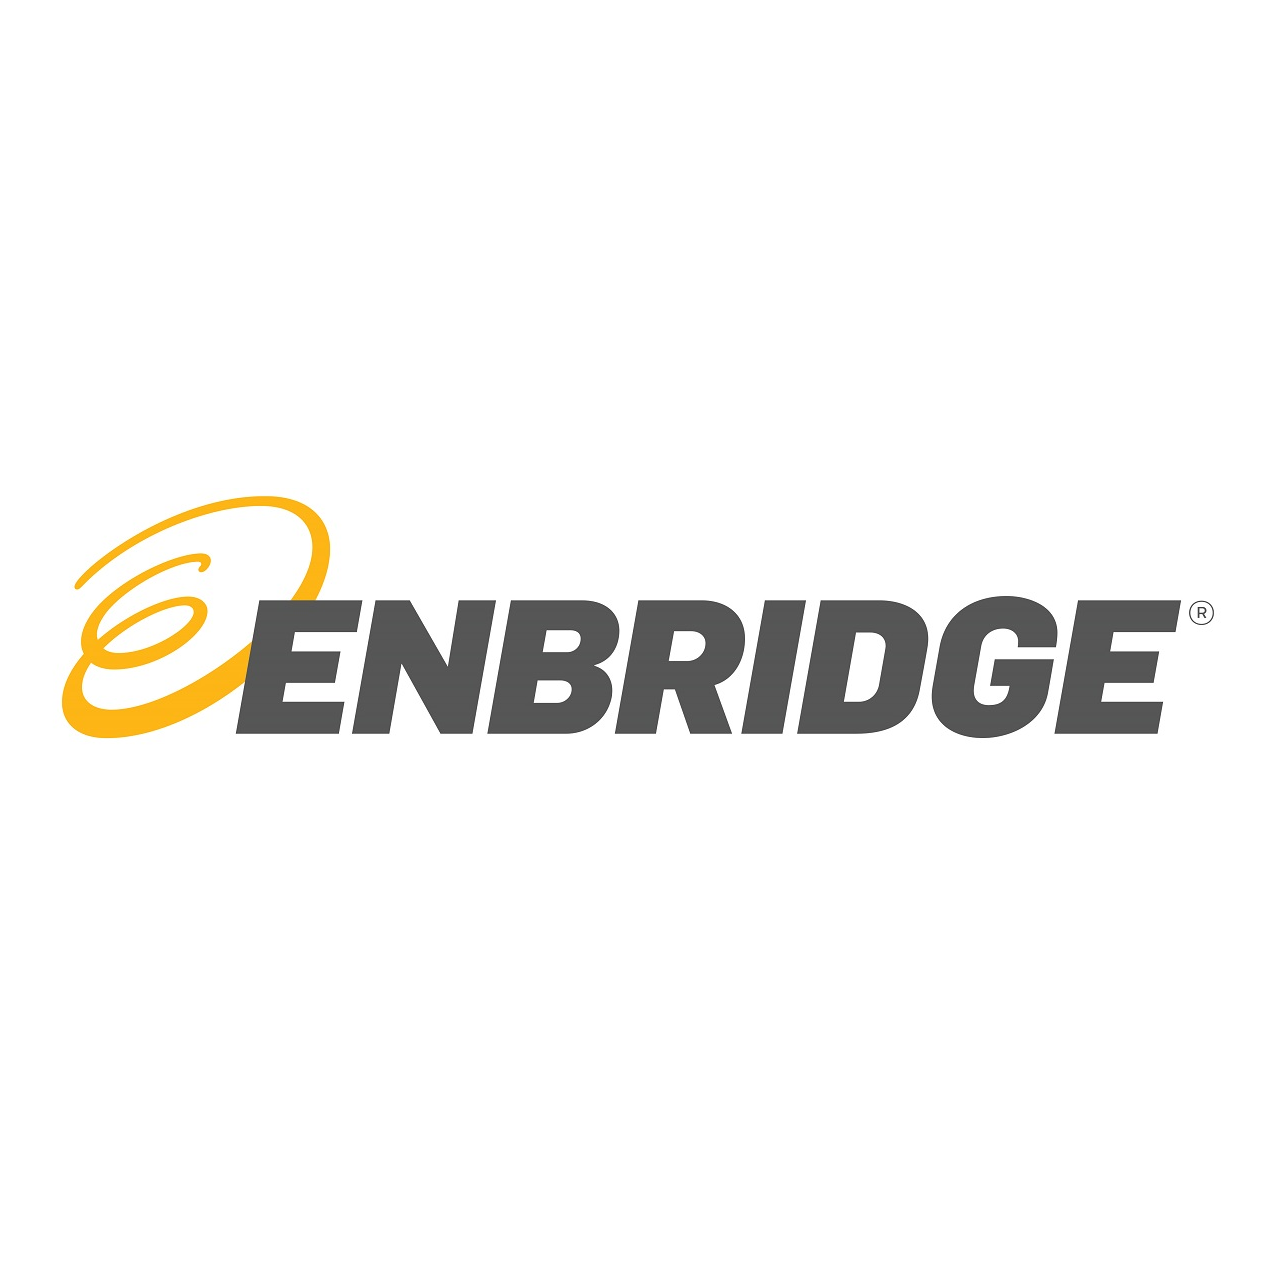 enbridge_logo_square